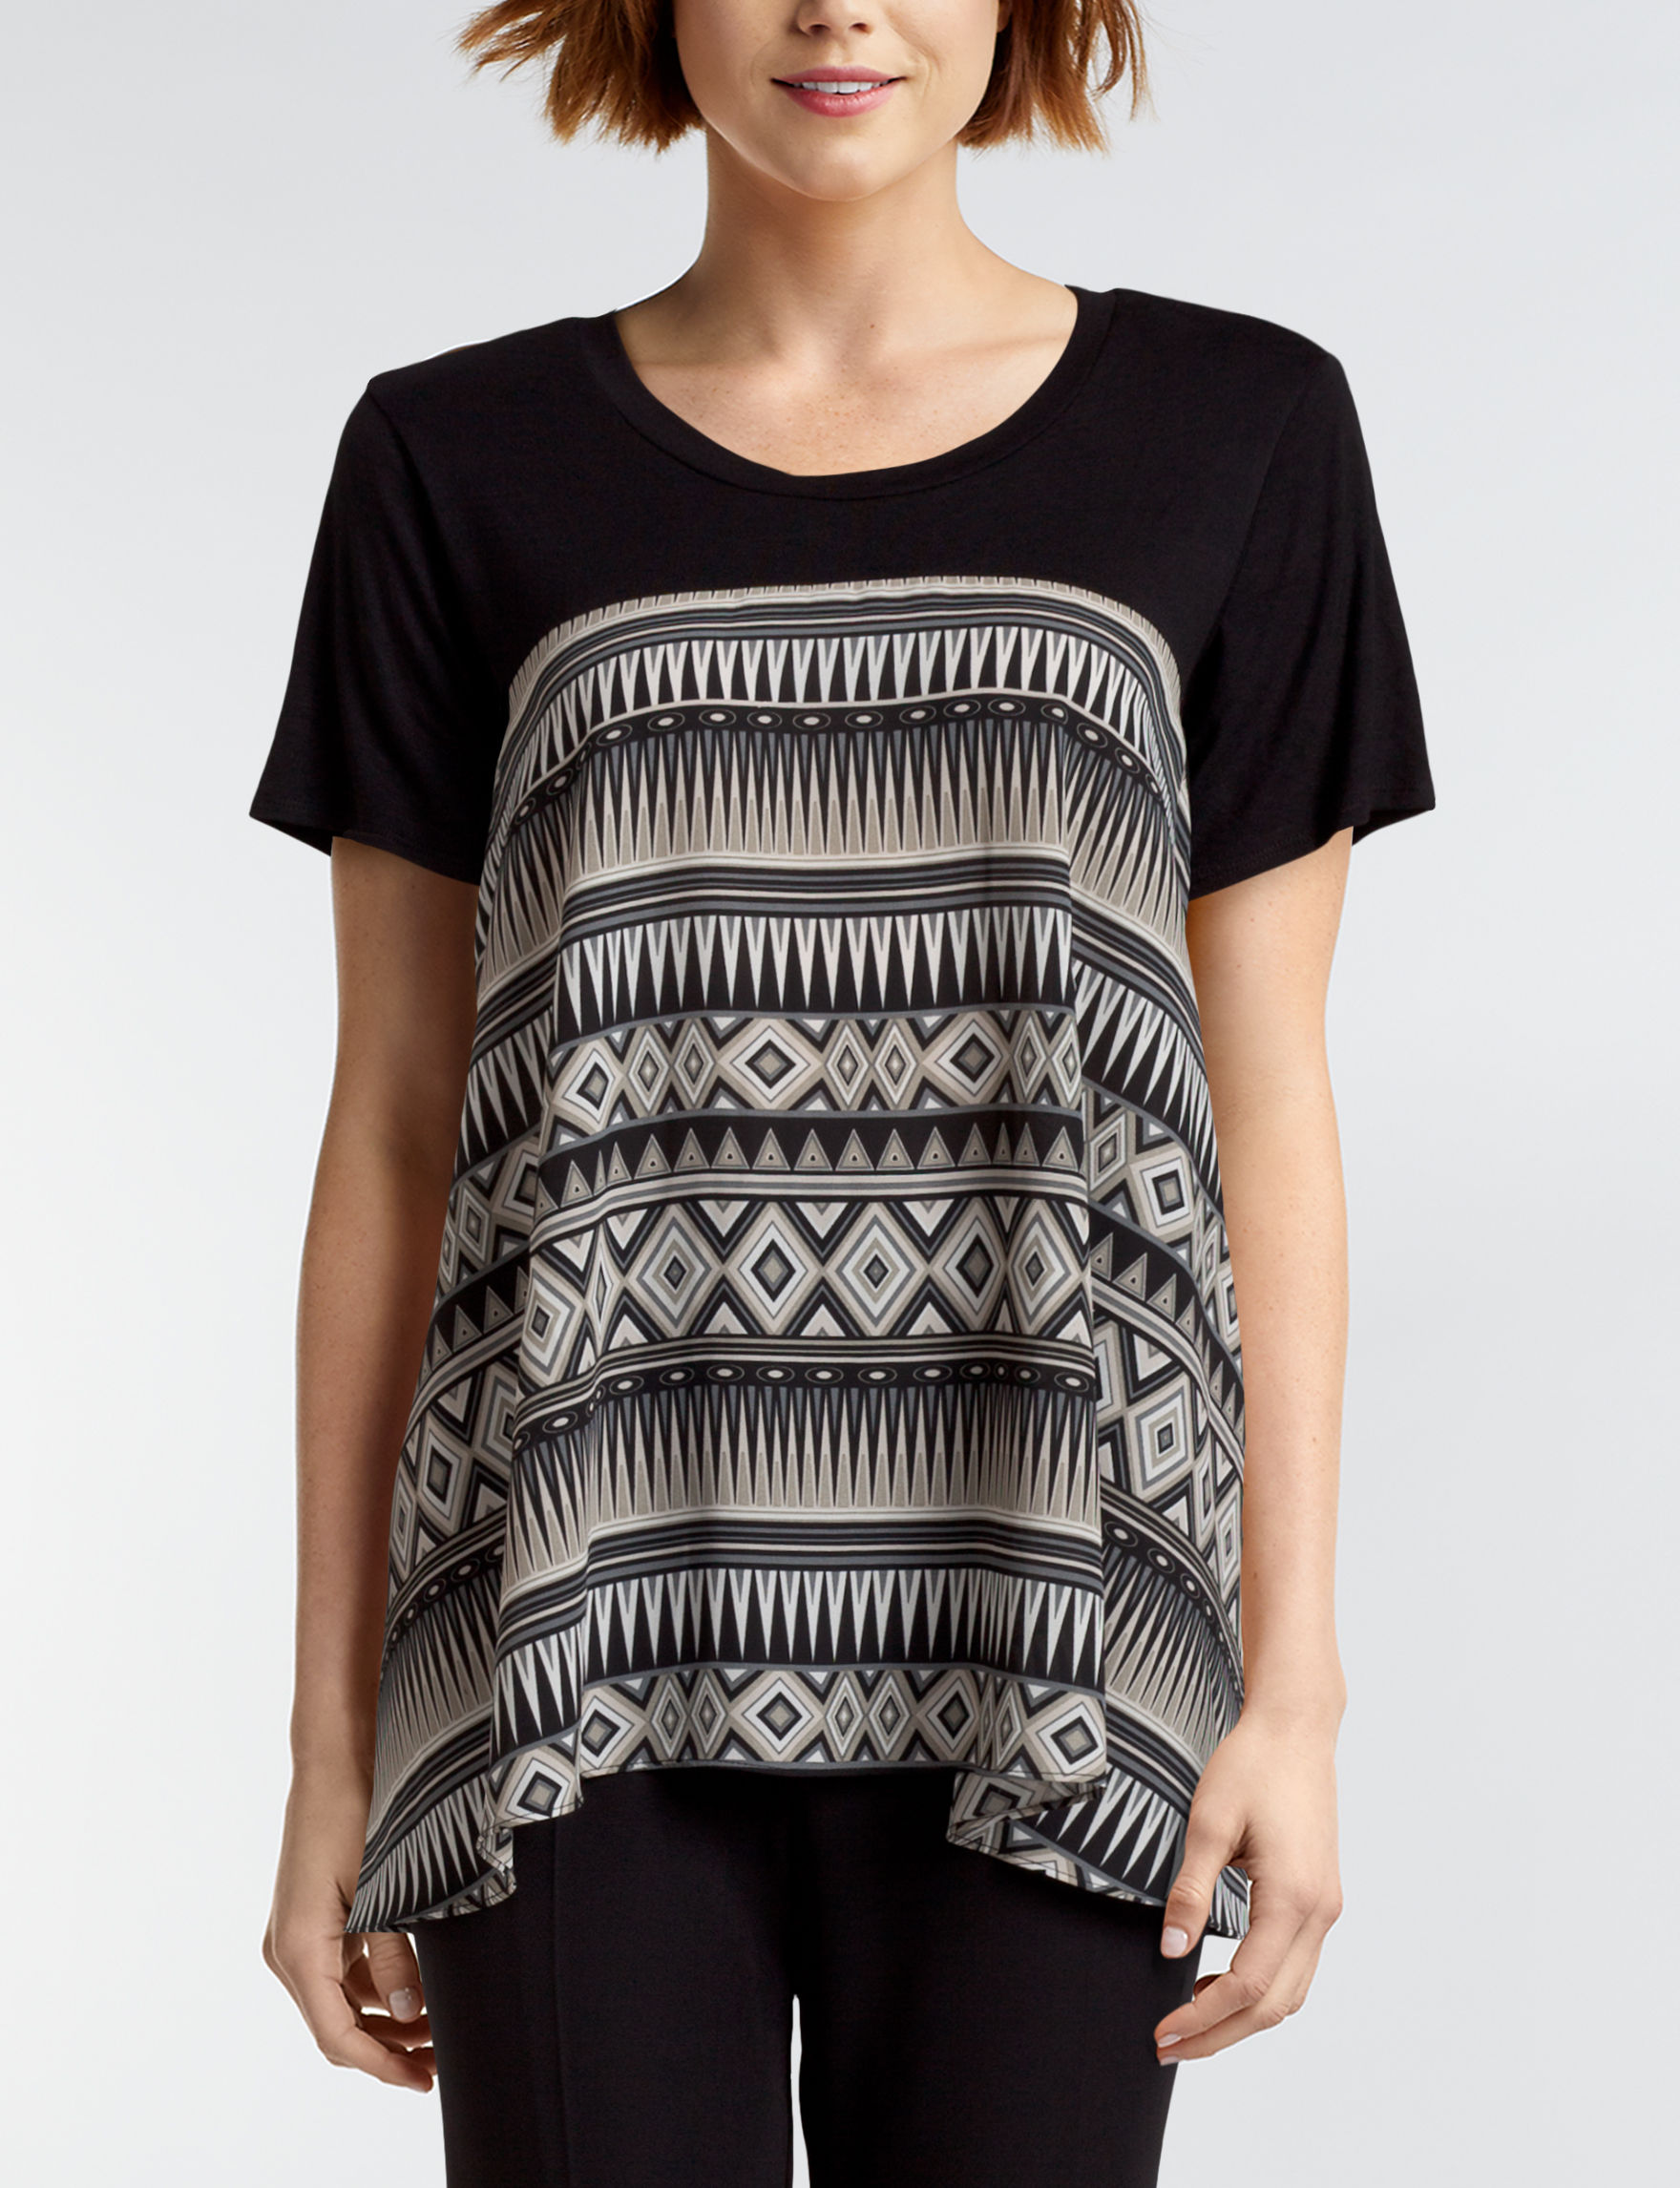 Hannah Grey Multi Shirts & Blouses